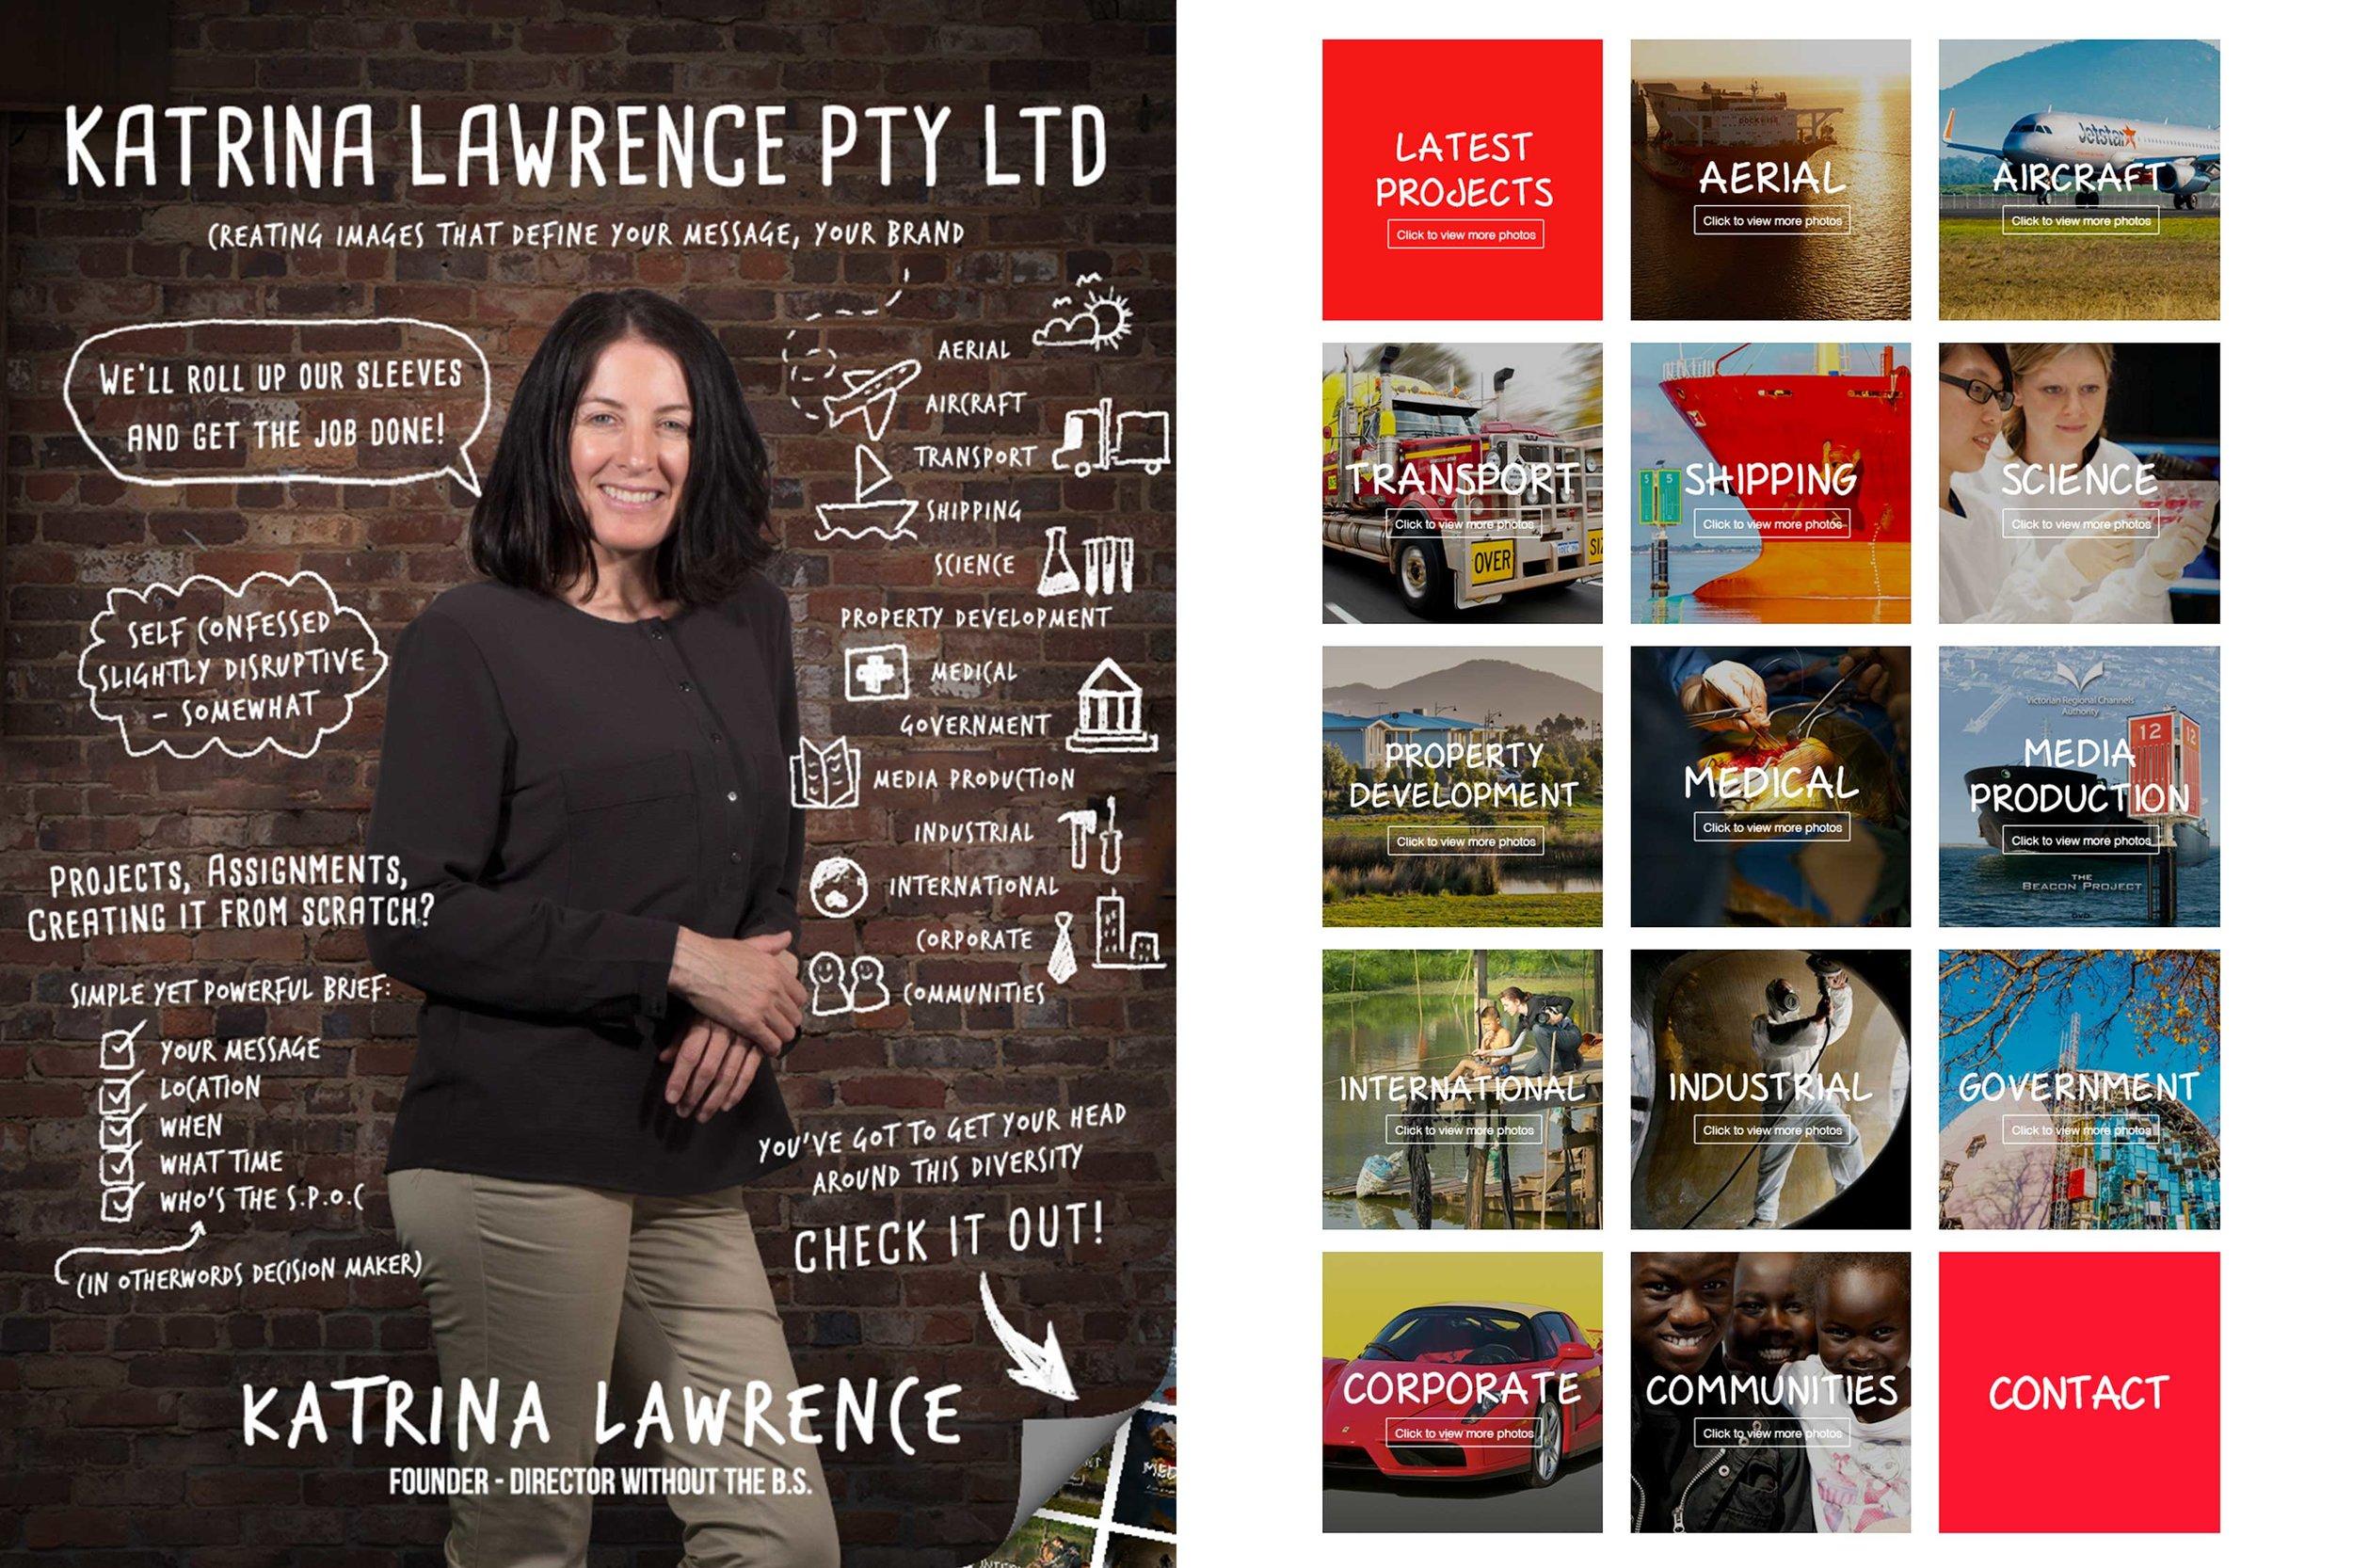 katrina-lawrence-pty-ltd.jpg